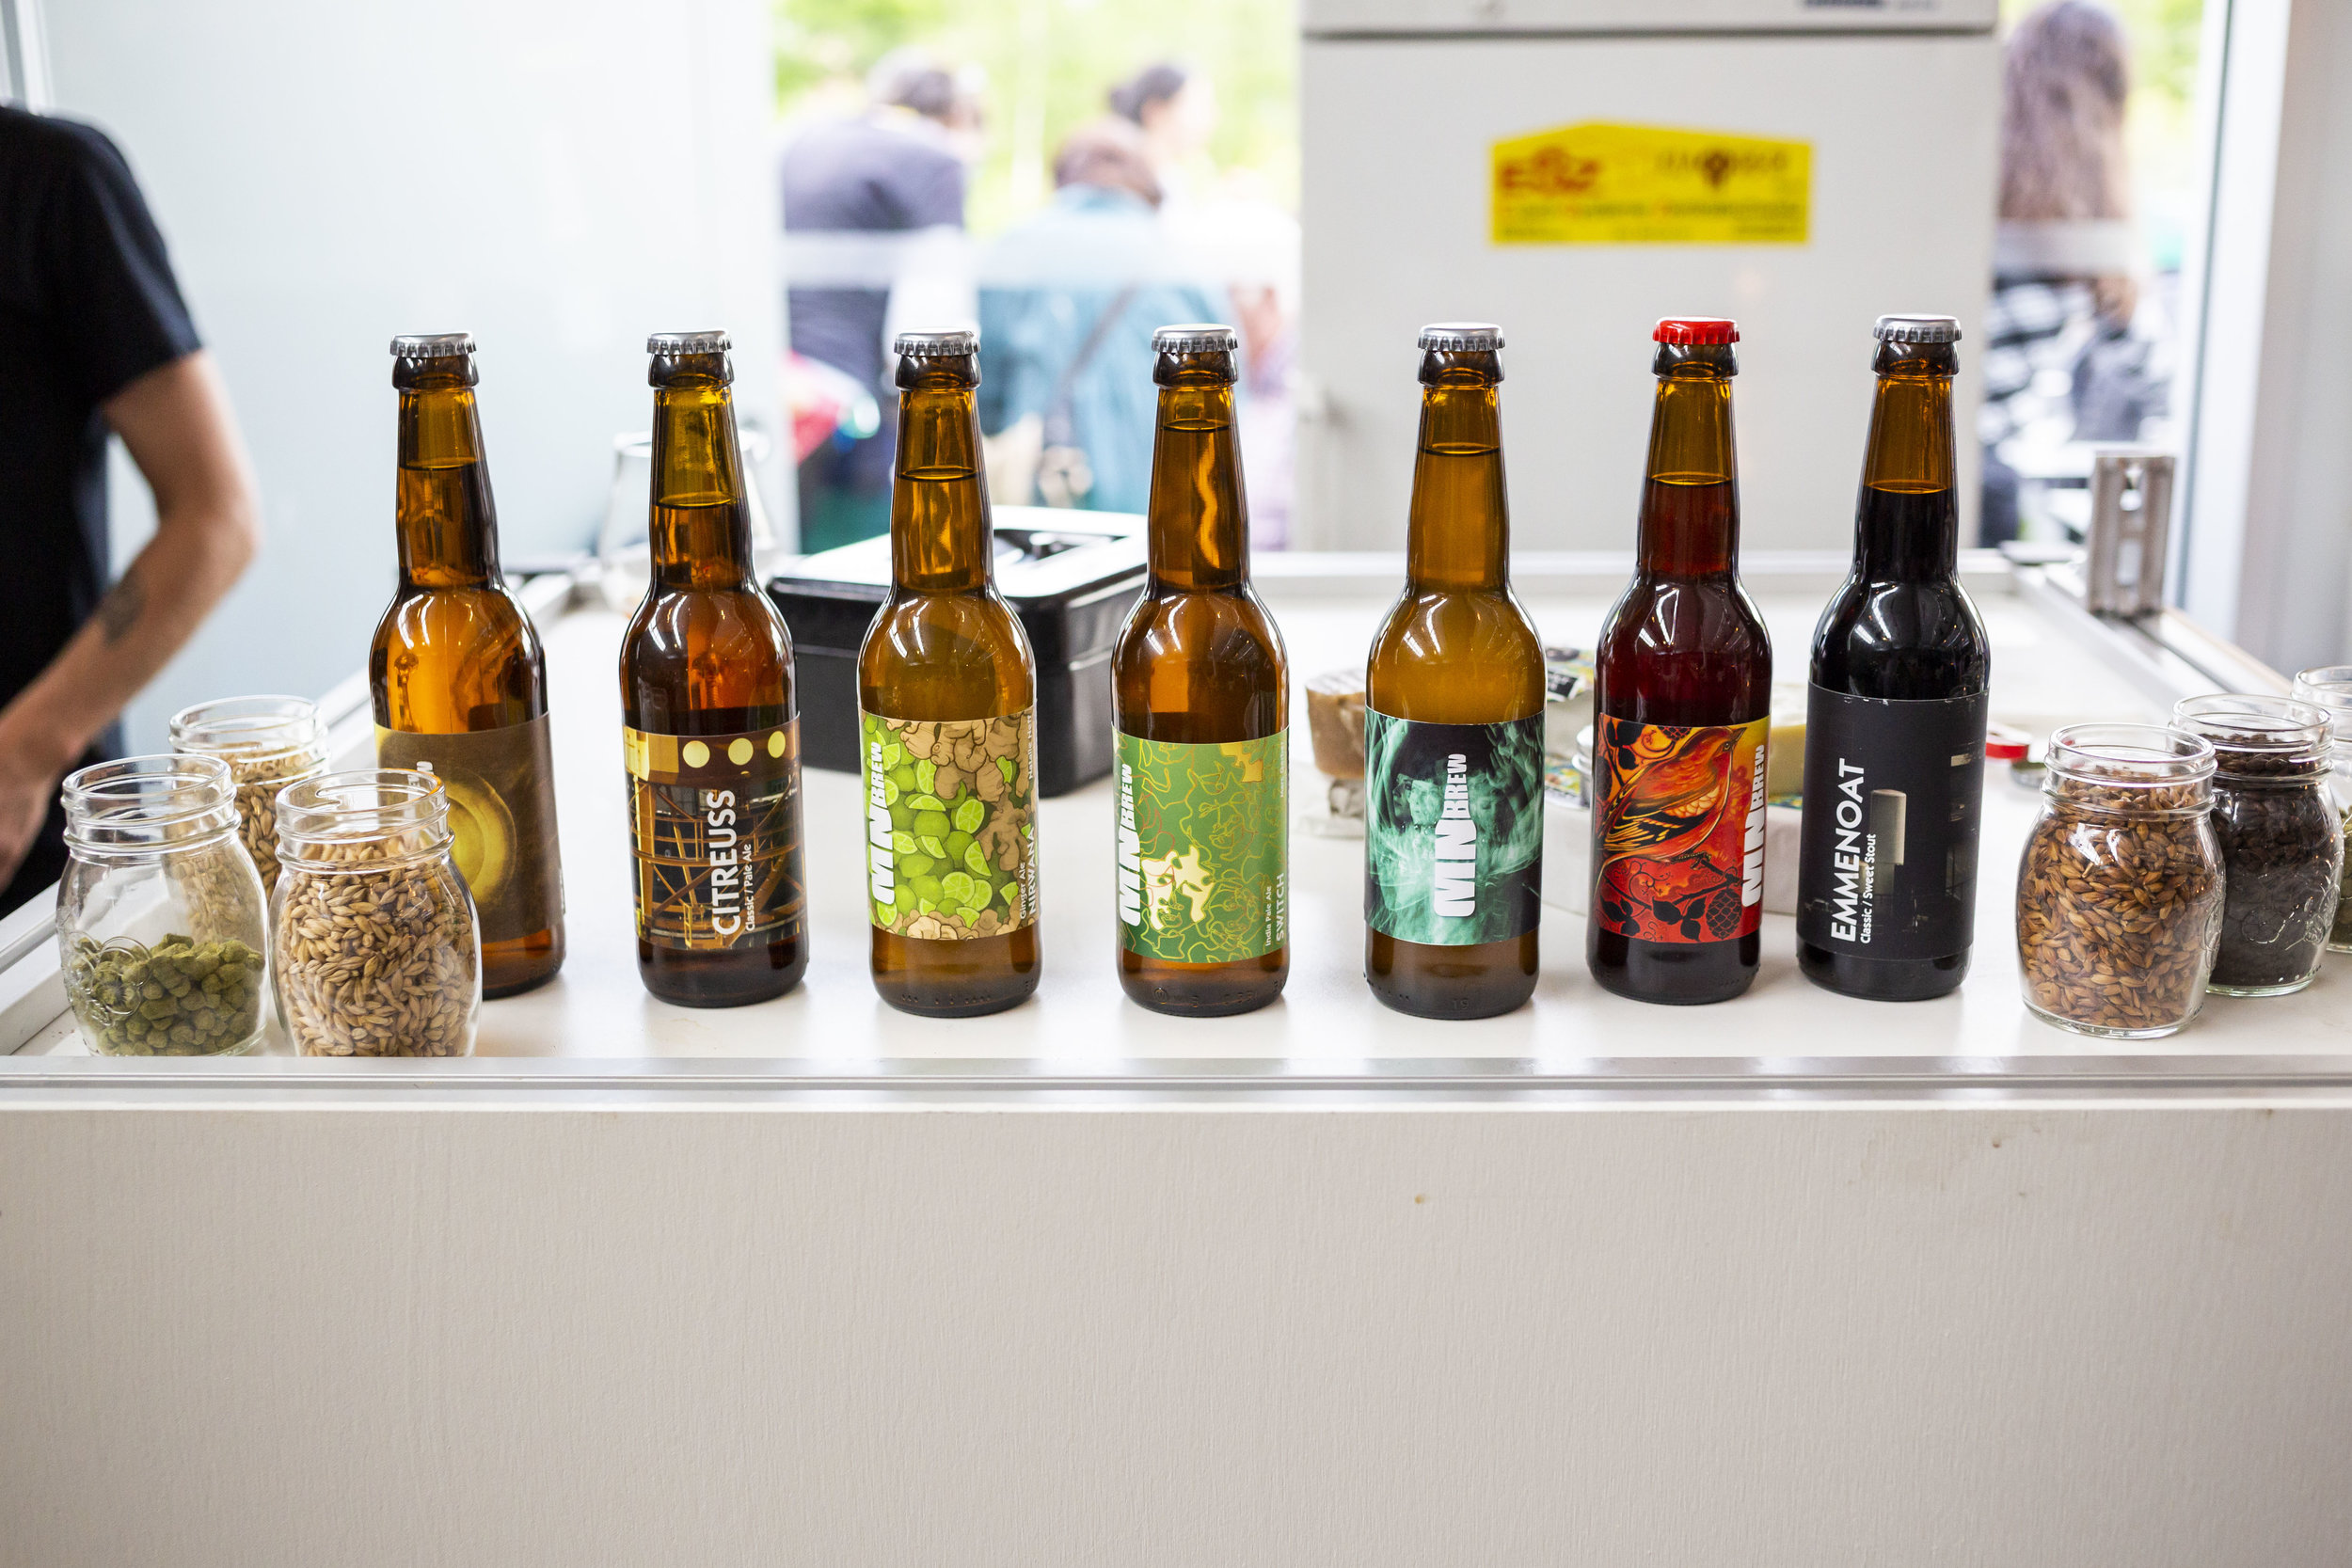 BierfestivalLuzern-43.jpg